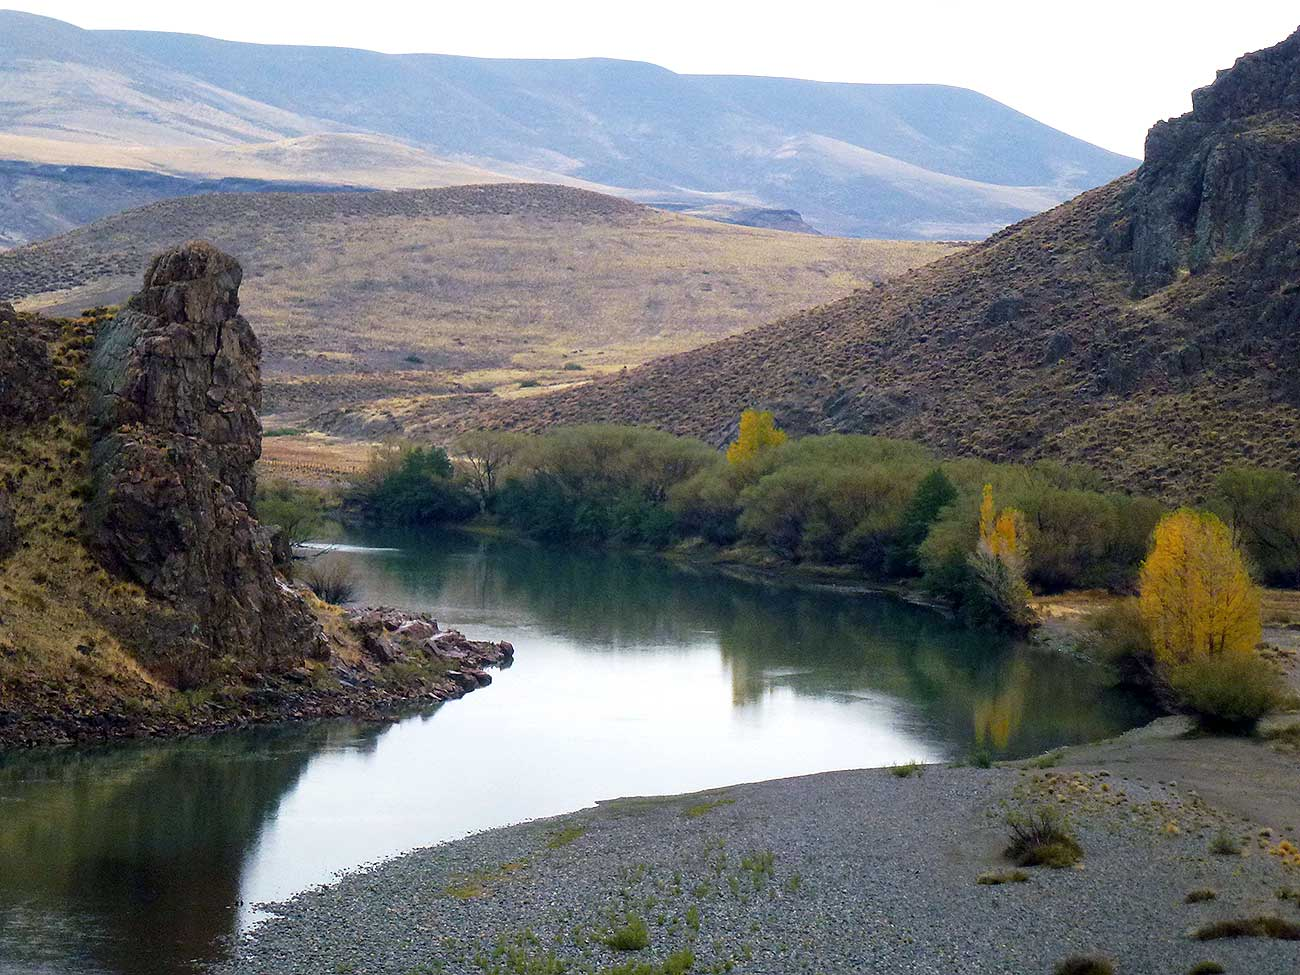 Río Collón Curá